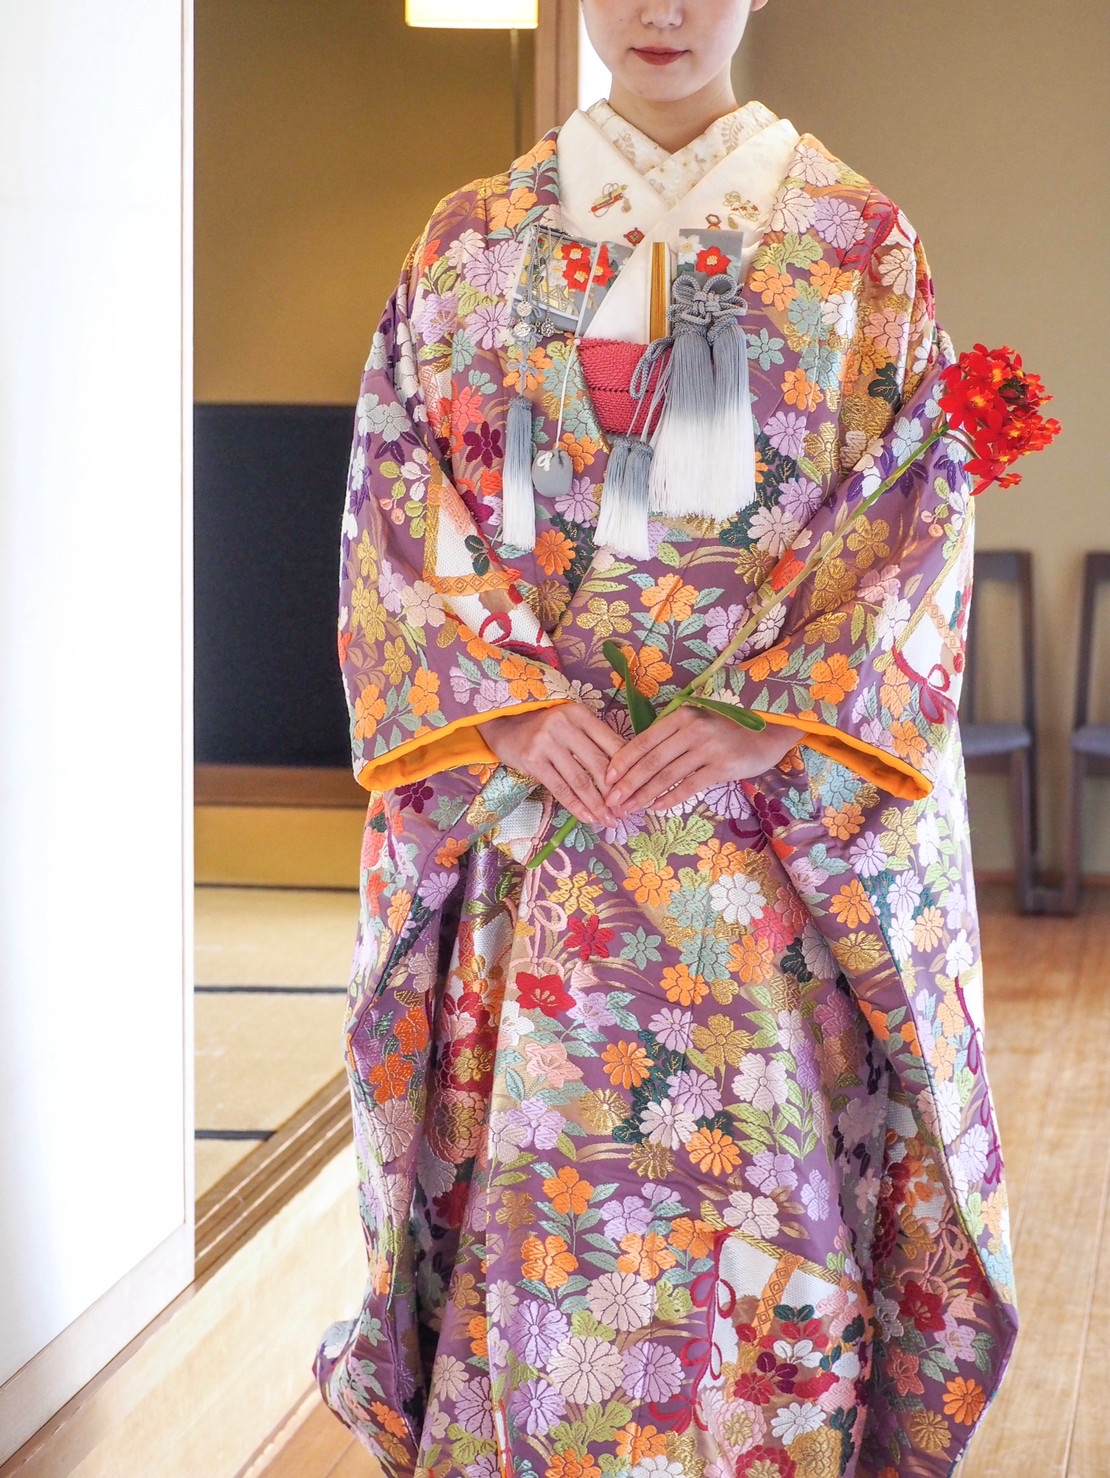 THE TREAT DRESSING神戸店にてお取り扱いのある紫色の色打掛のご紹介